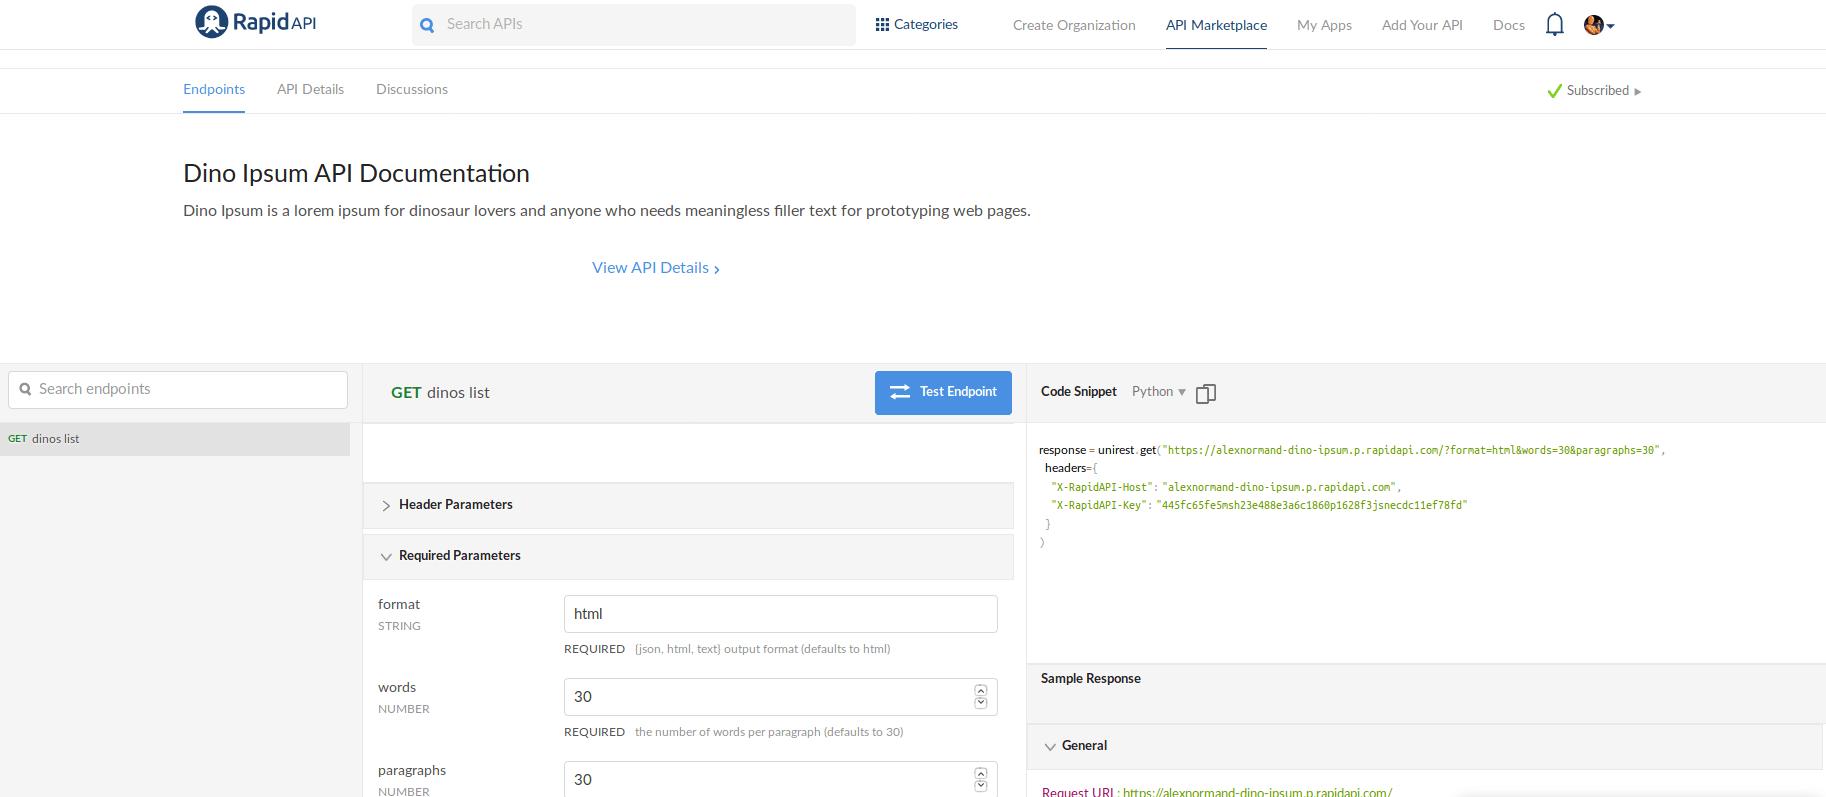 dino ipsum api documentation